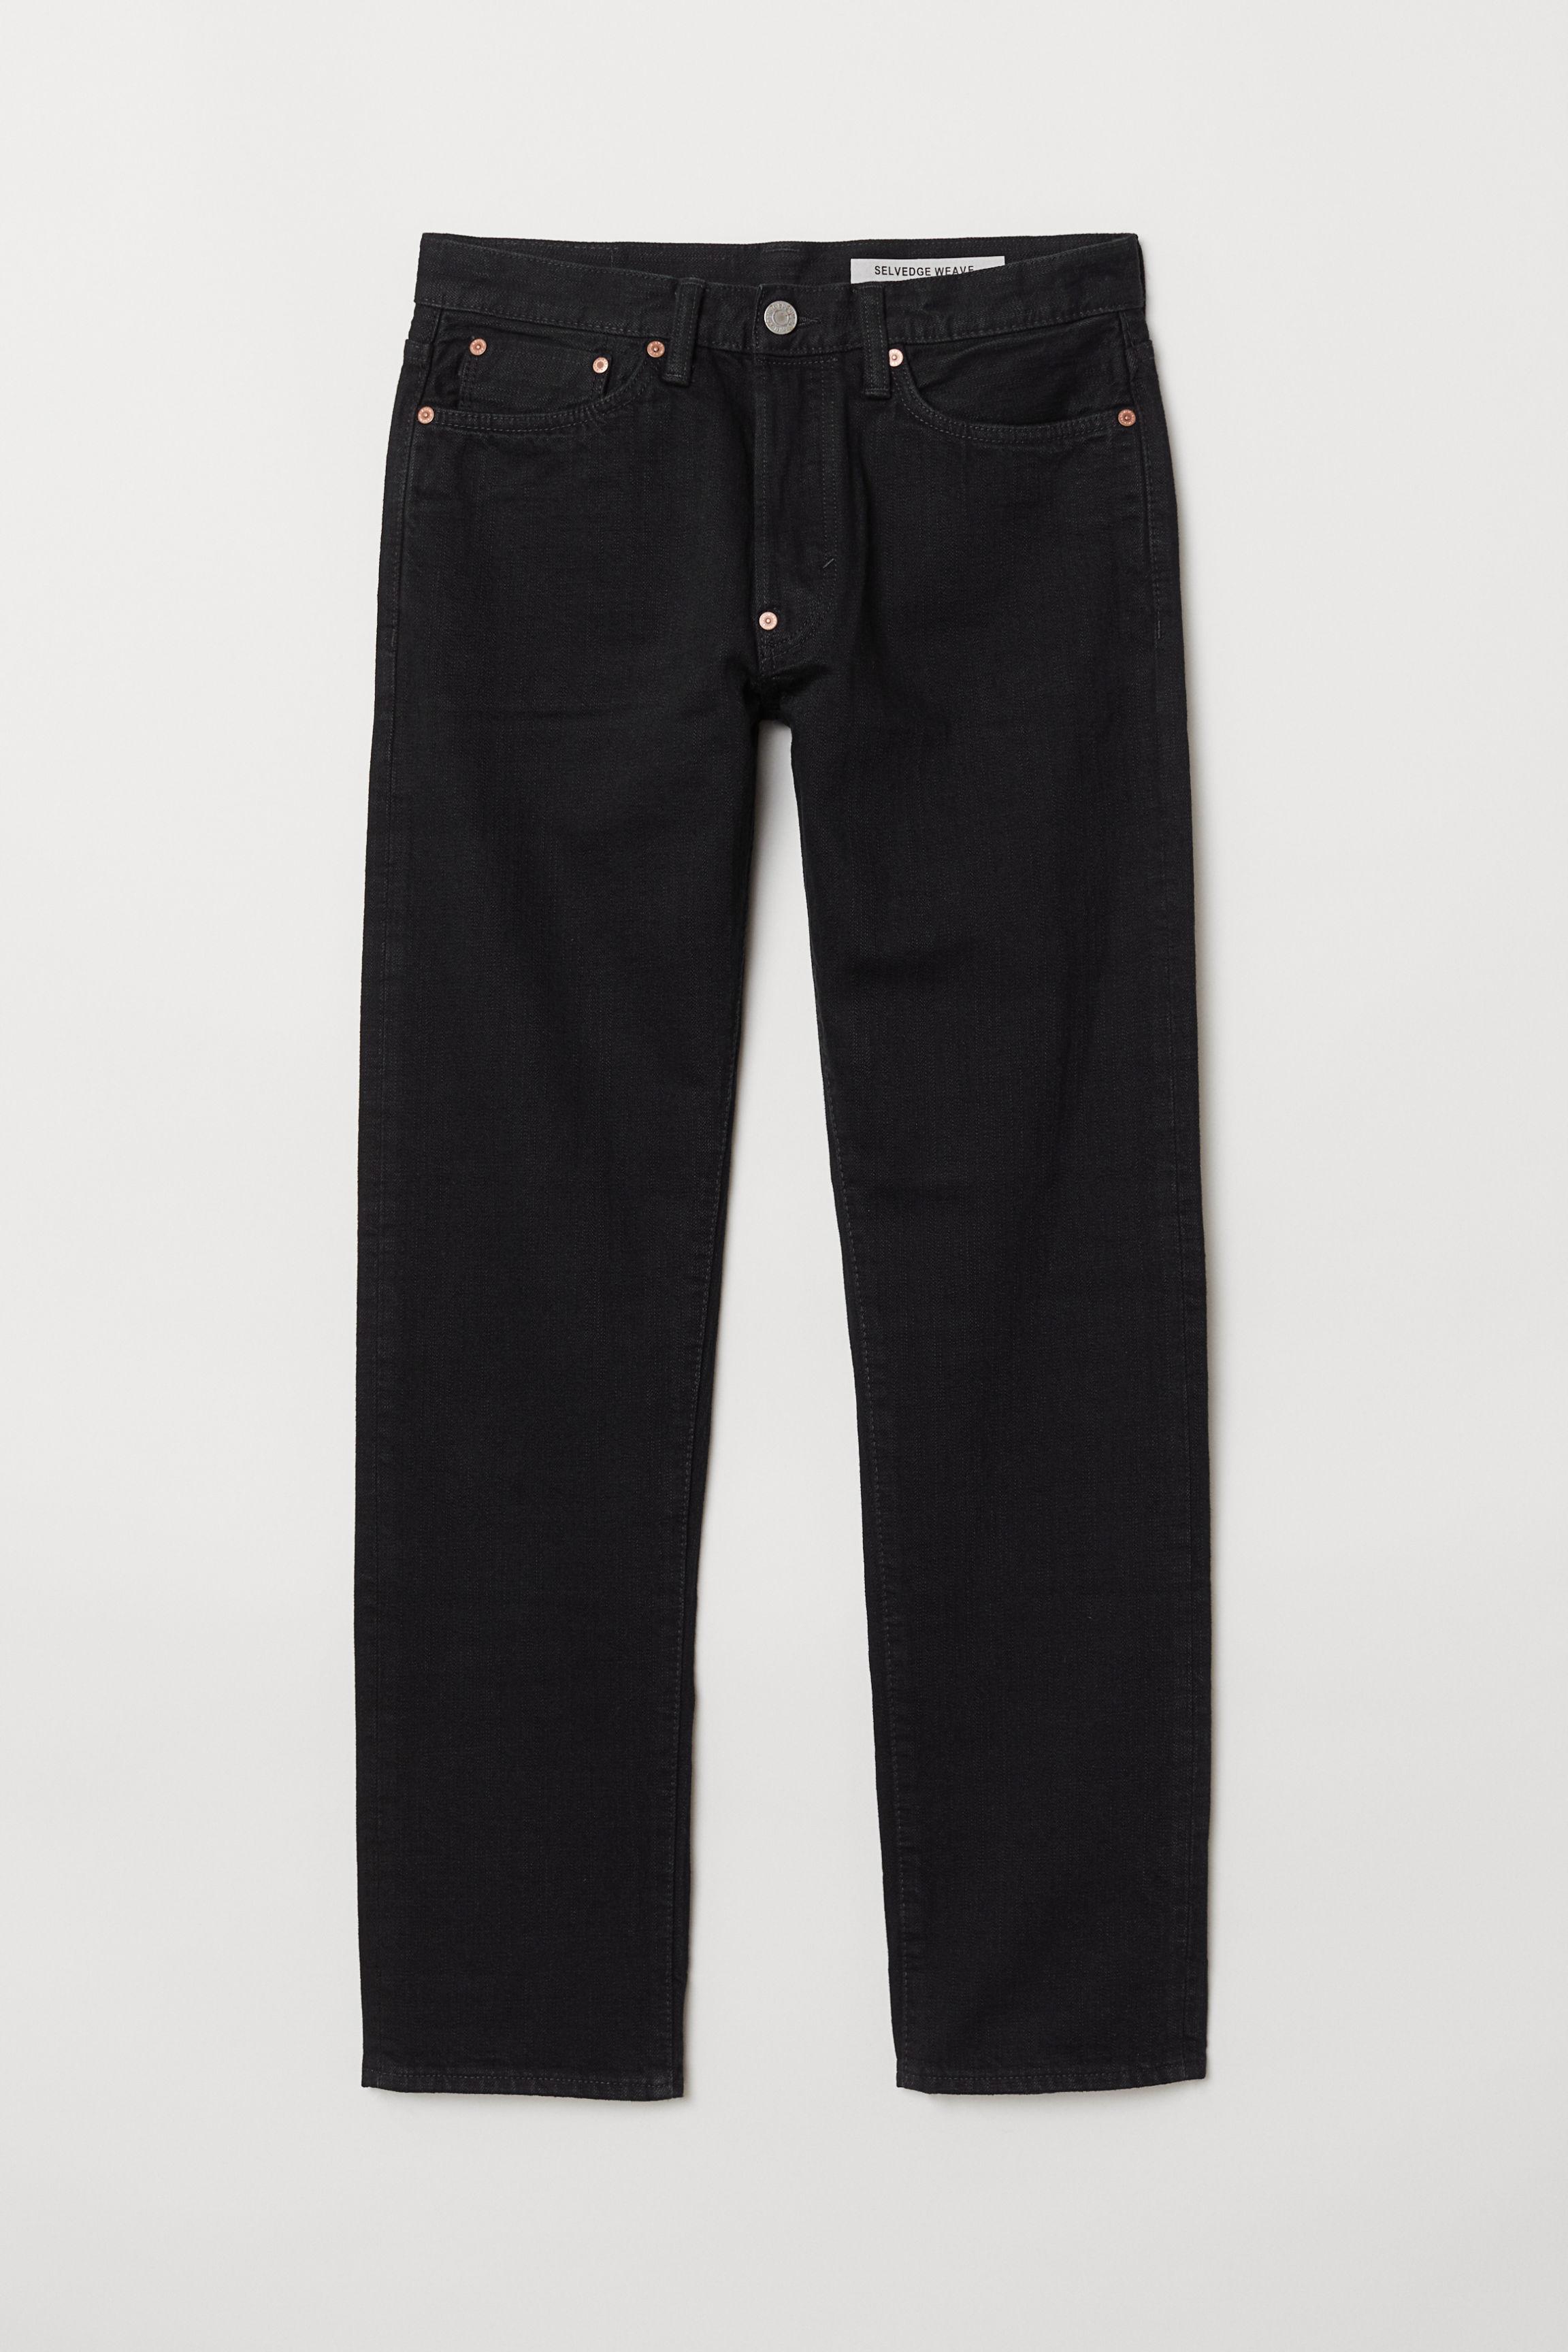 09d7eb5a566 Straight Selvedge Jeans - Dark denim blue - Men